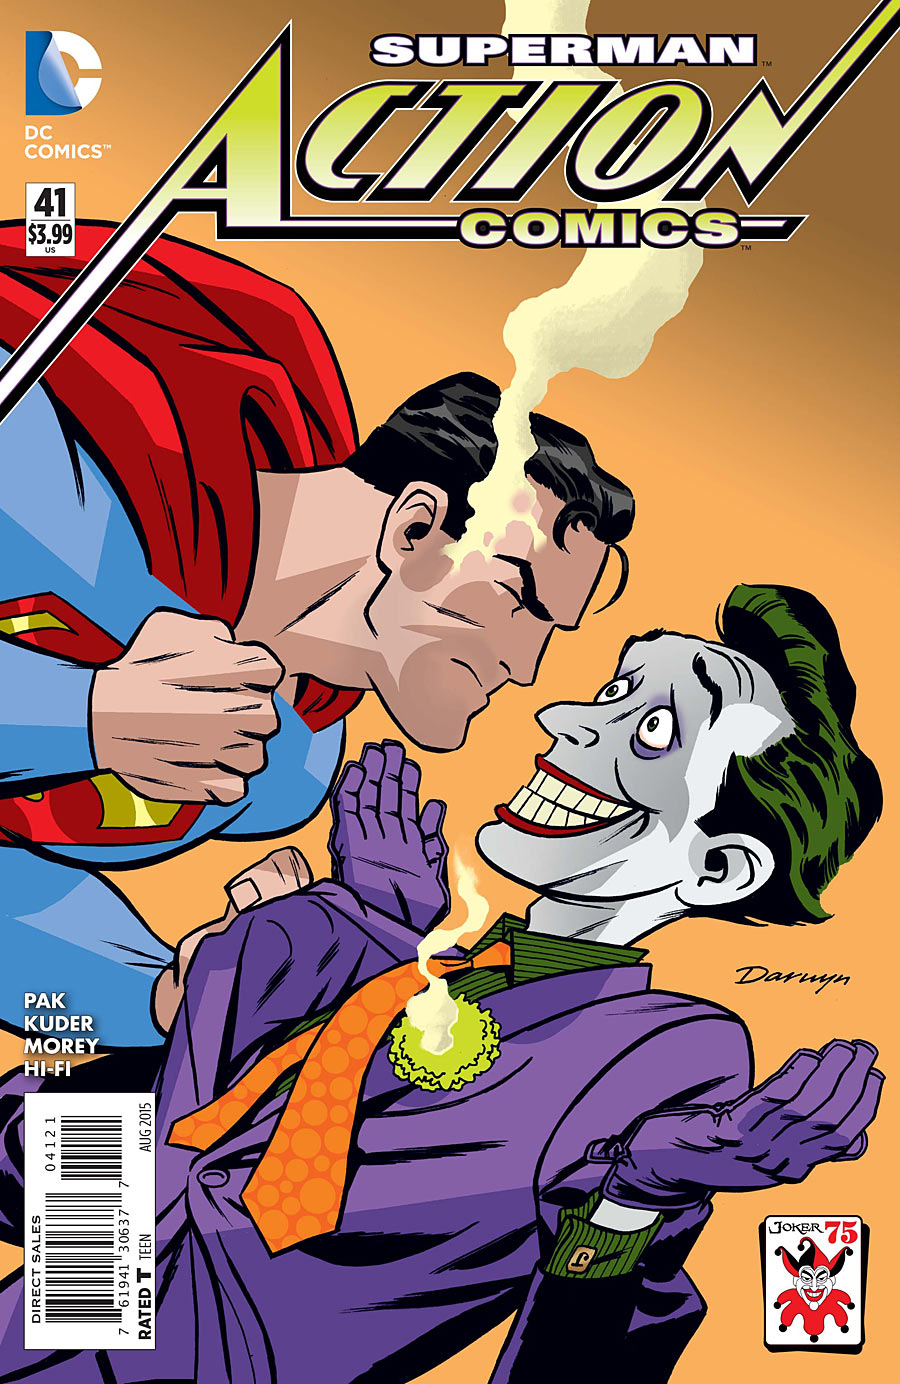 Action Comics Vol 2 41 Joker Variant.jpg